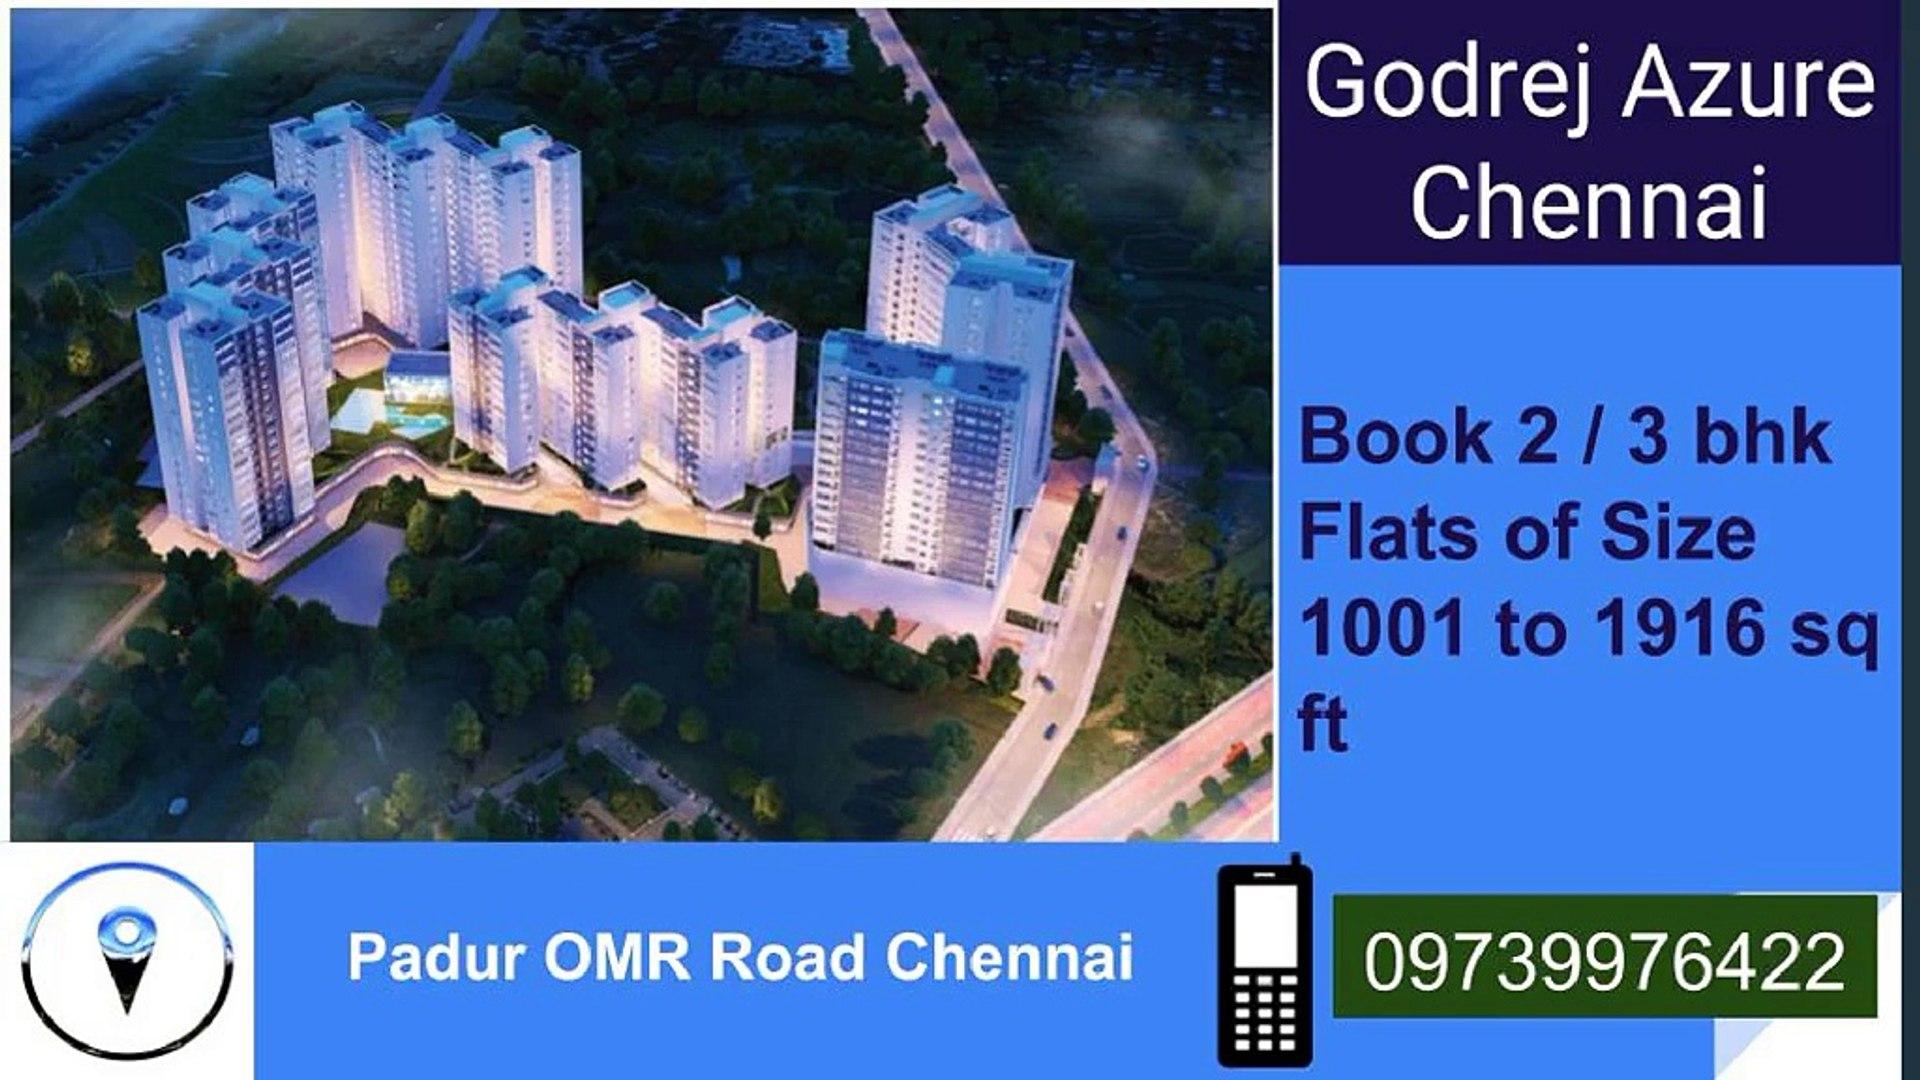 Godrej Azure Upcoming Residential Property In Padur Chennai Video